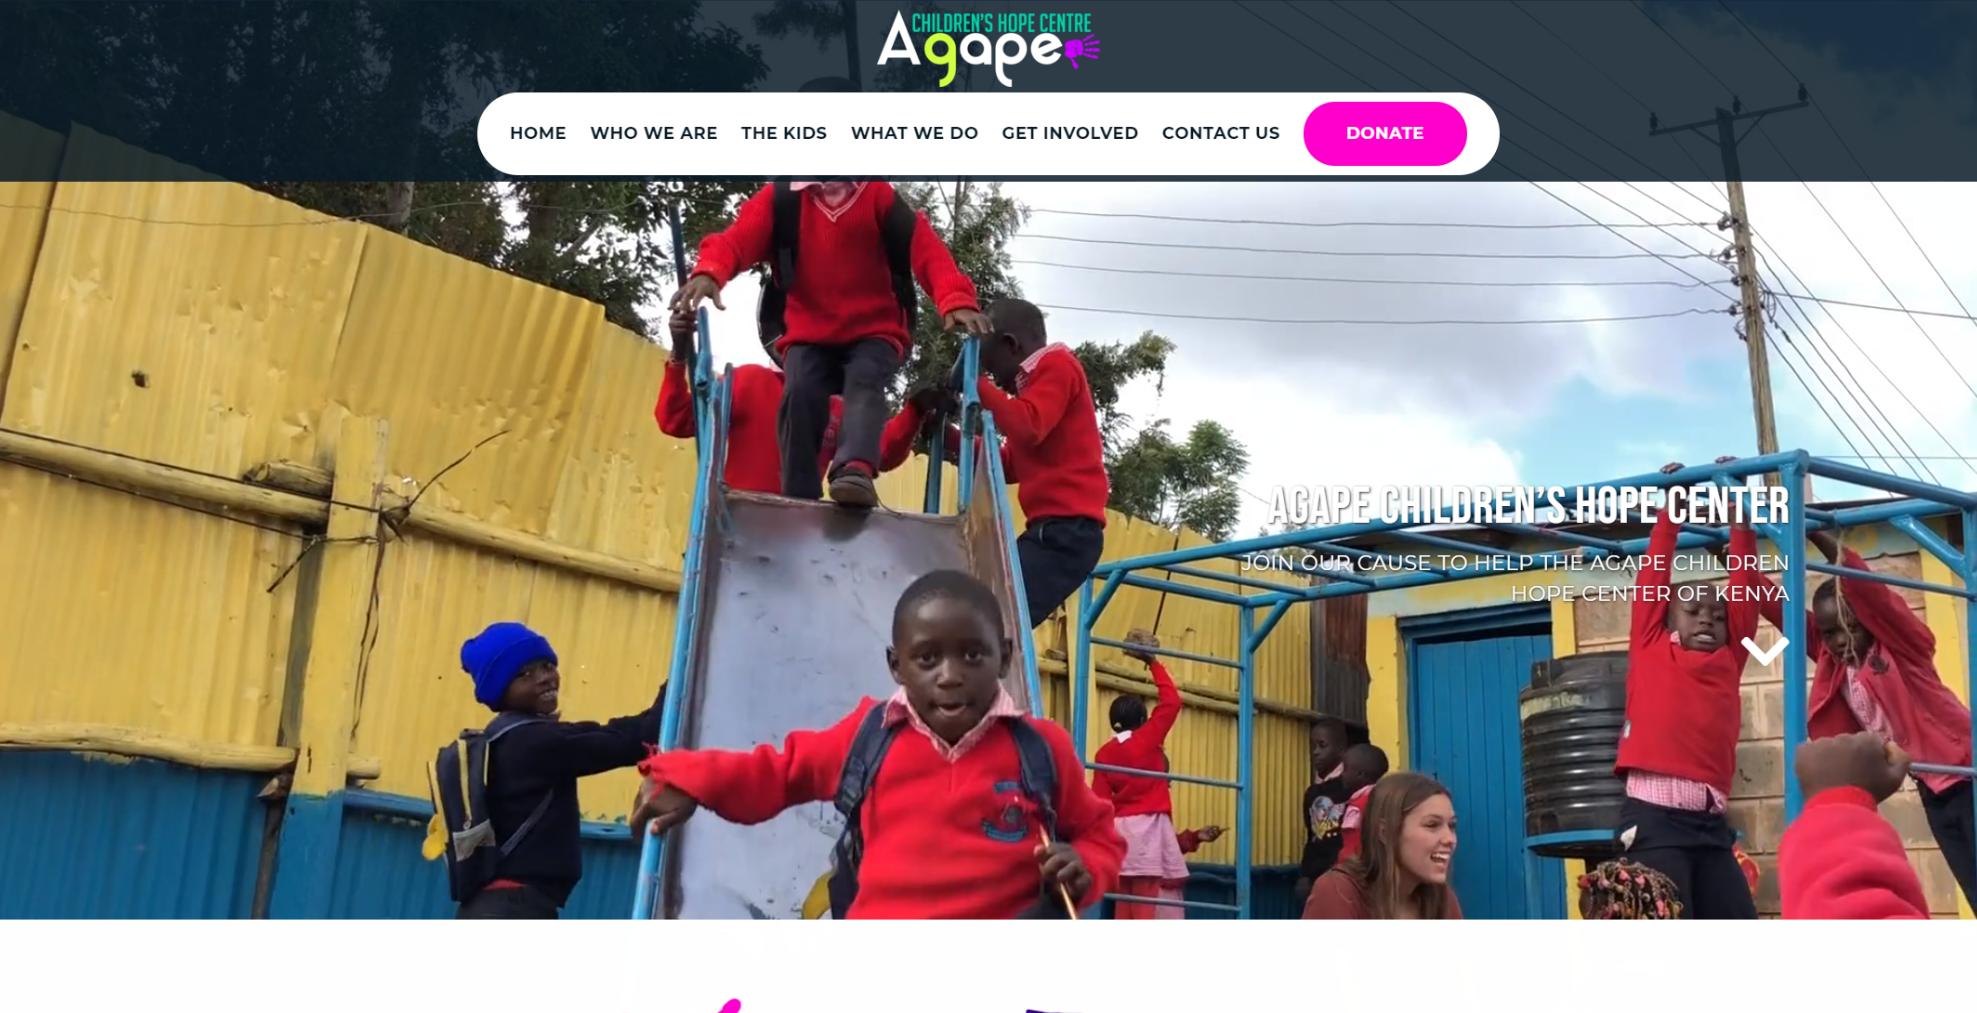 las vegas website development by 702 Pros LLC for Agape Children Hope Centre | Justin Young